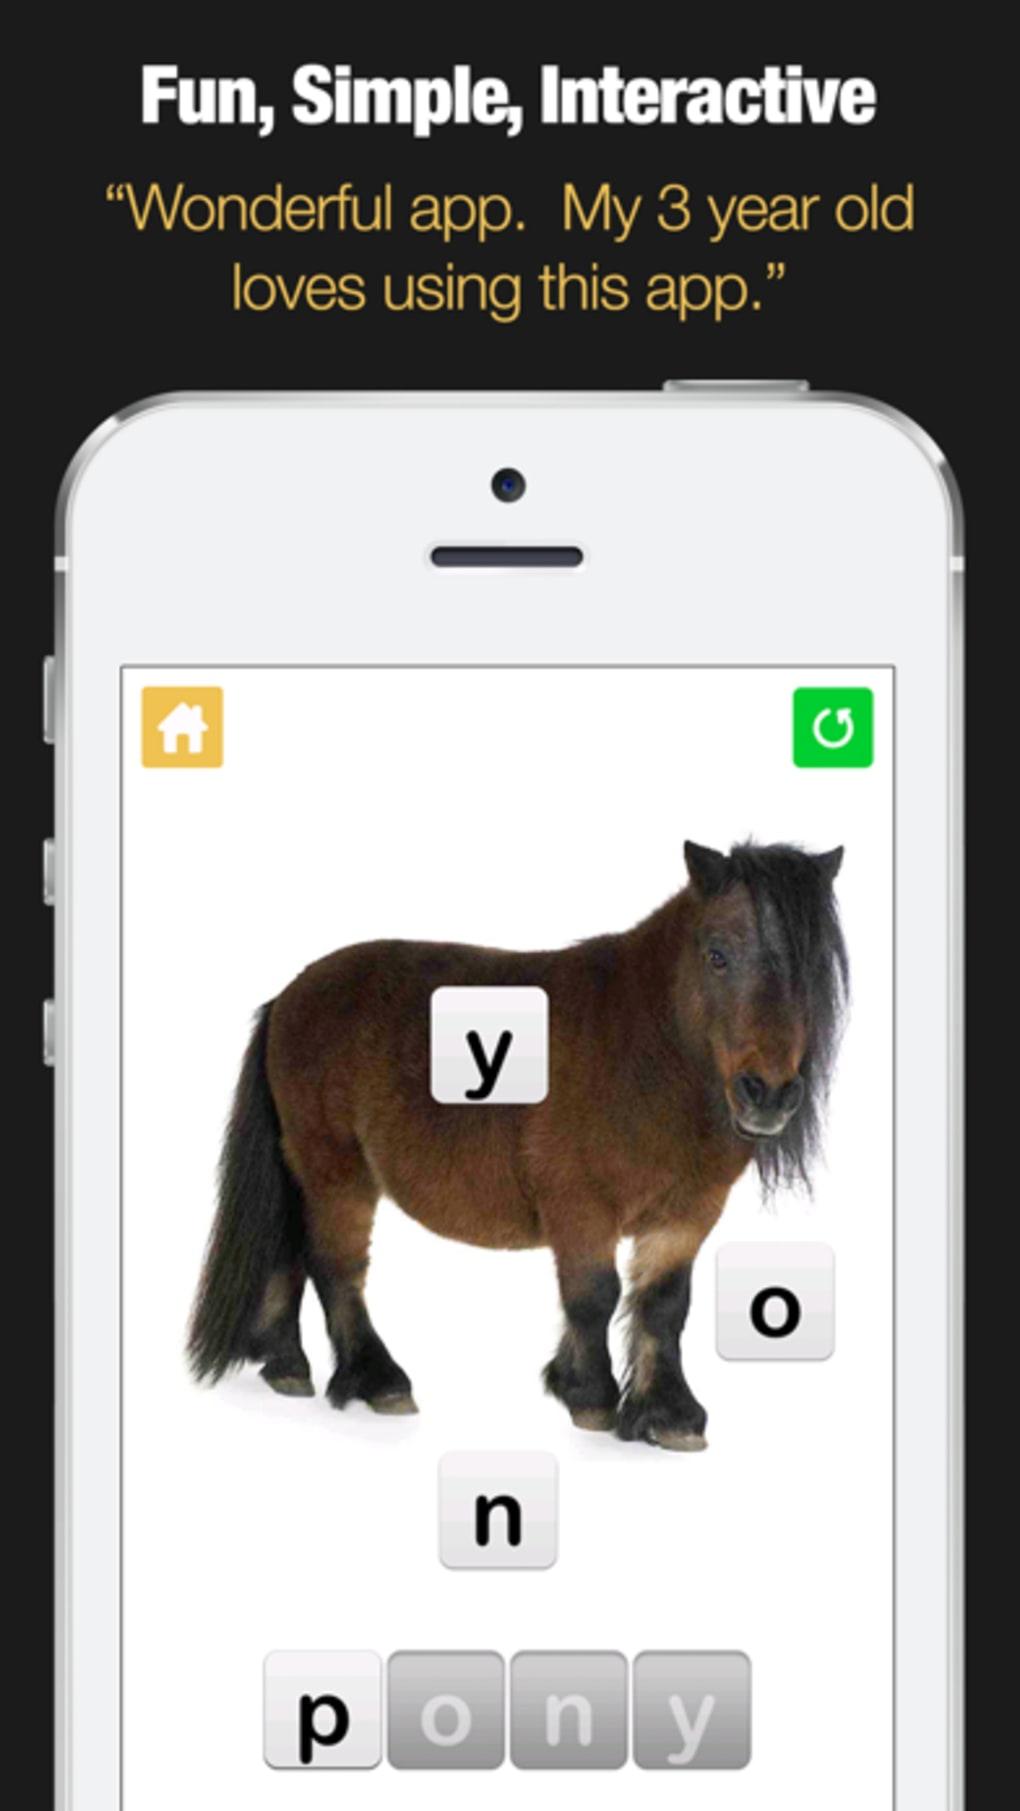 Spelling Bee for Kids - Spell 4 Letter Words for iPhone